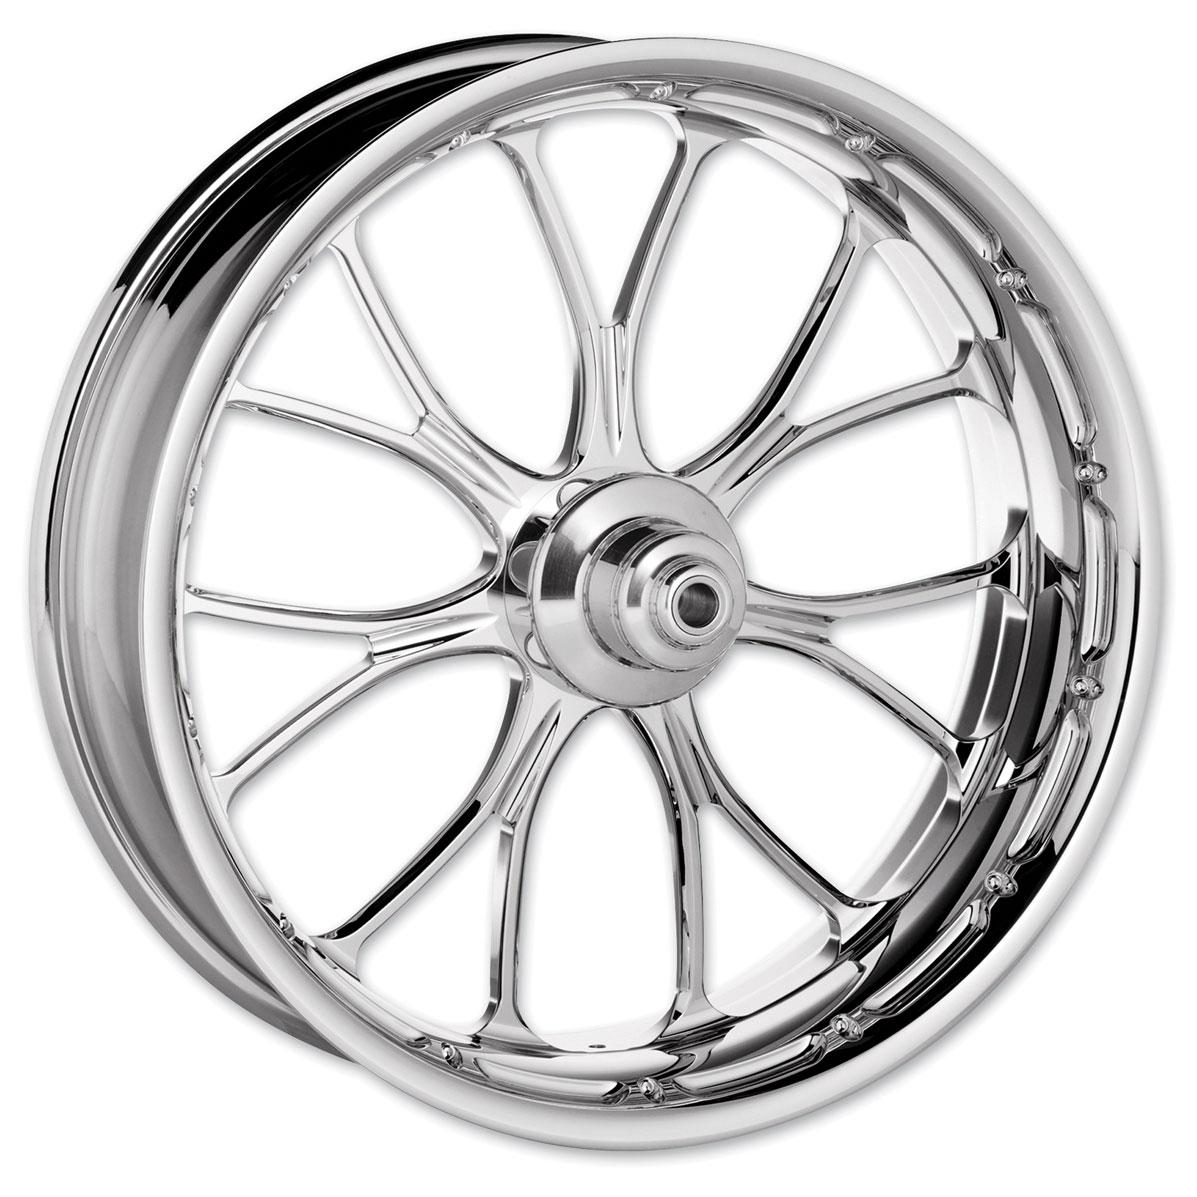 Performance Machine Heathen Chrome Front Wheel 19x3 Non-ABS Dual Disc